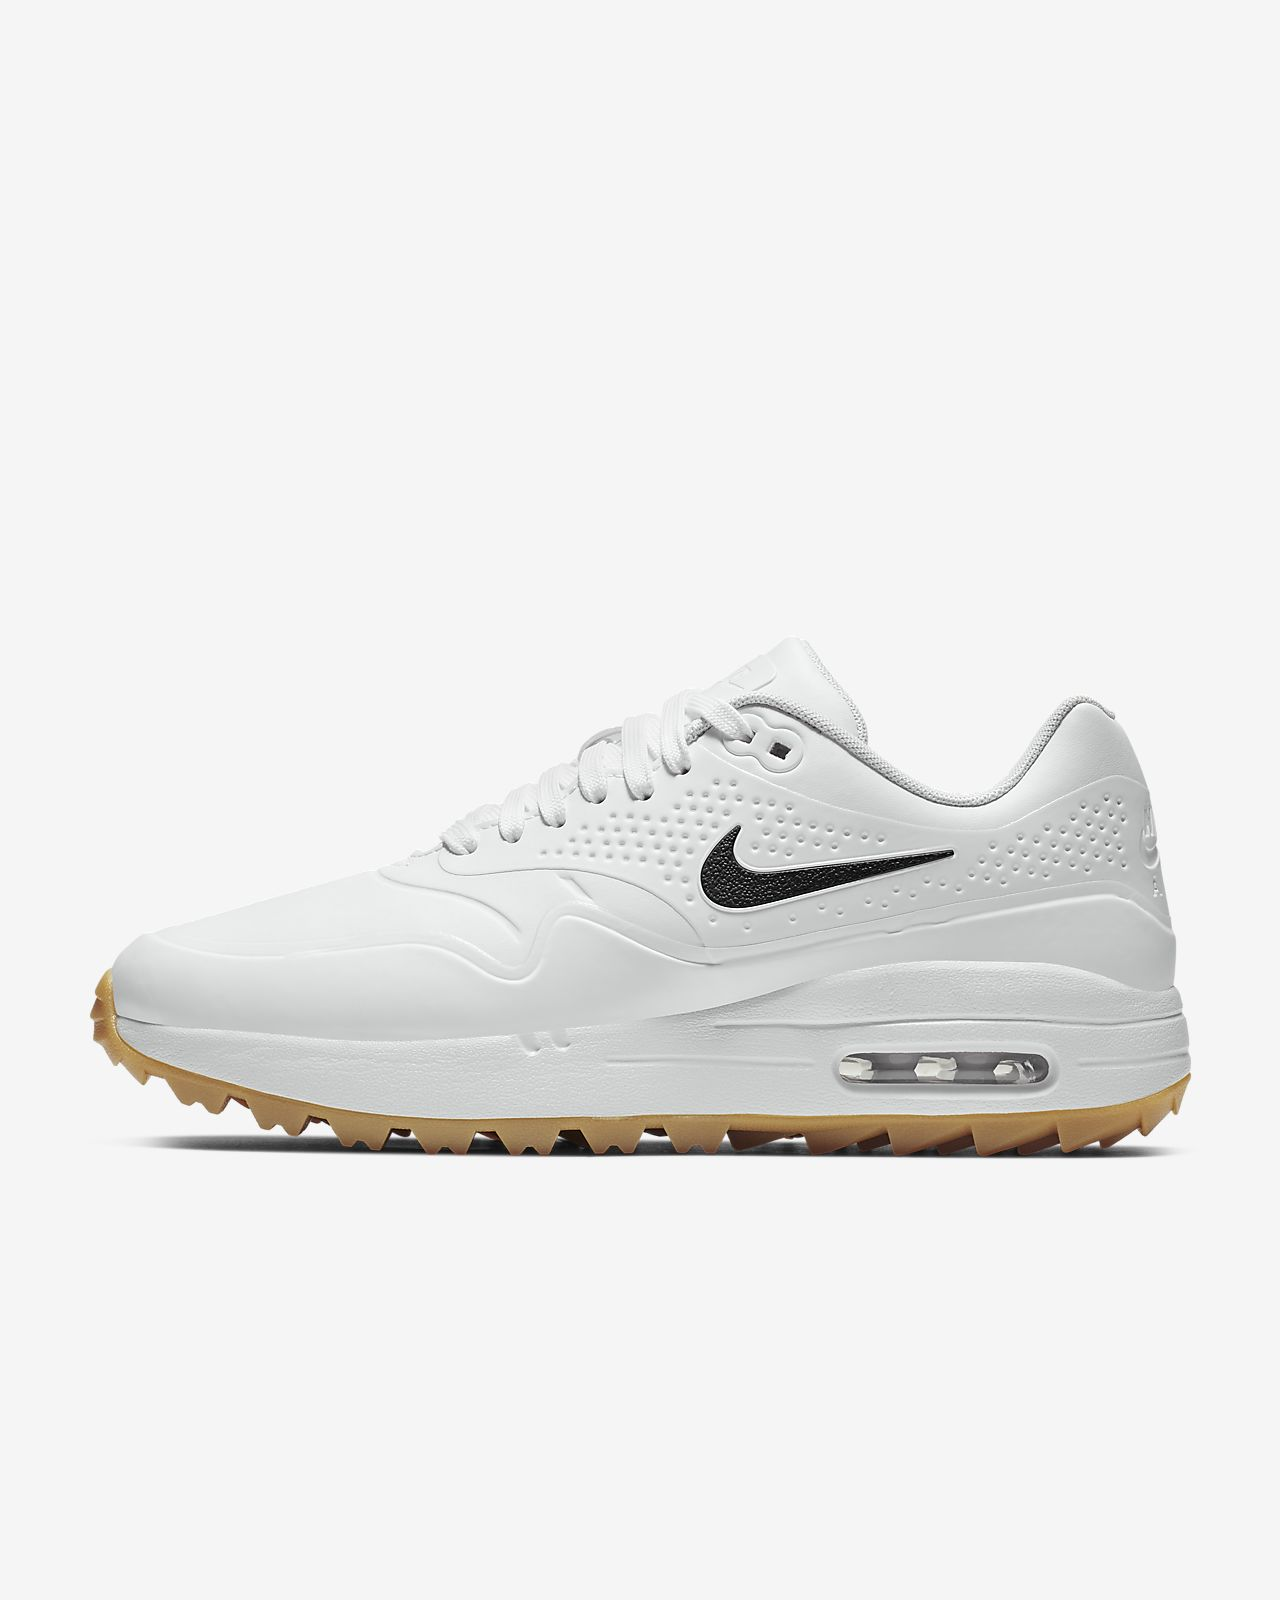 new style 01f8b 7f49a ... Chaussure de golf Nike Air Max 1 G pour Femme